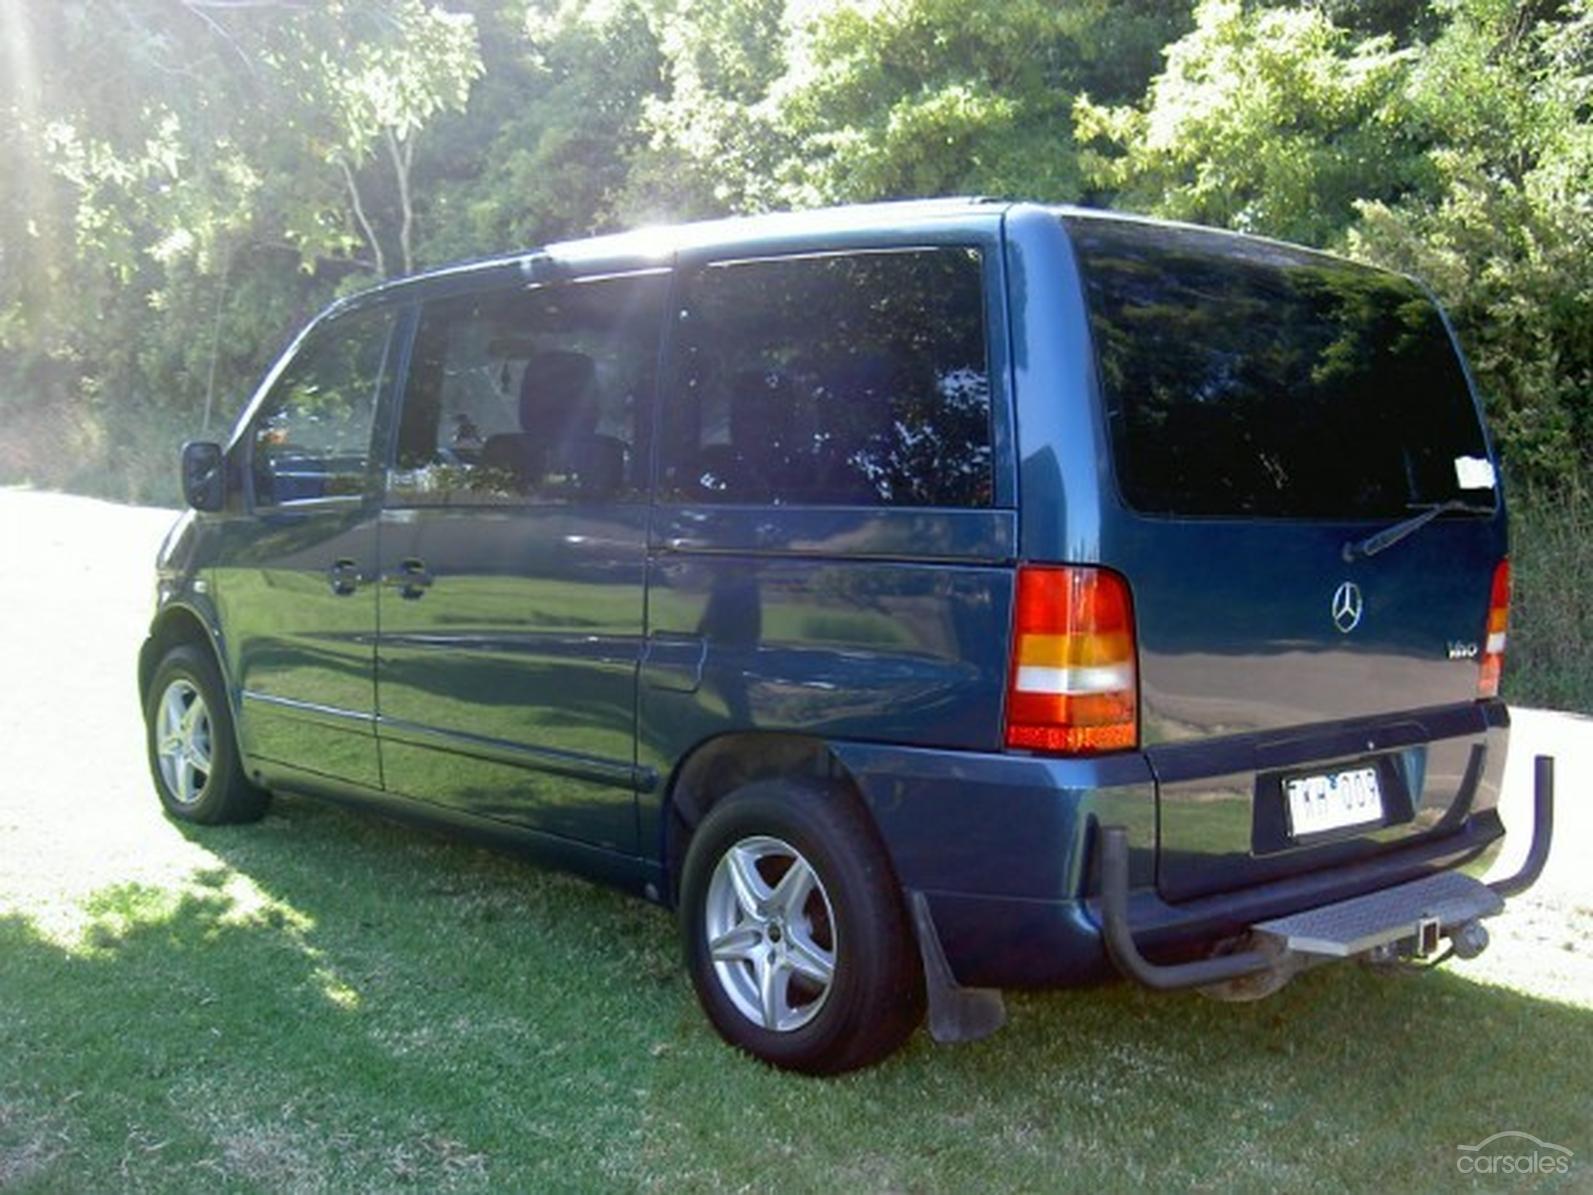 2003 Mercedes Benz Vito 108cdi Manual Sse Ad 572916 W638 Wiring Diagram